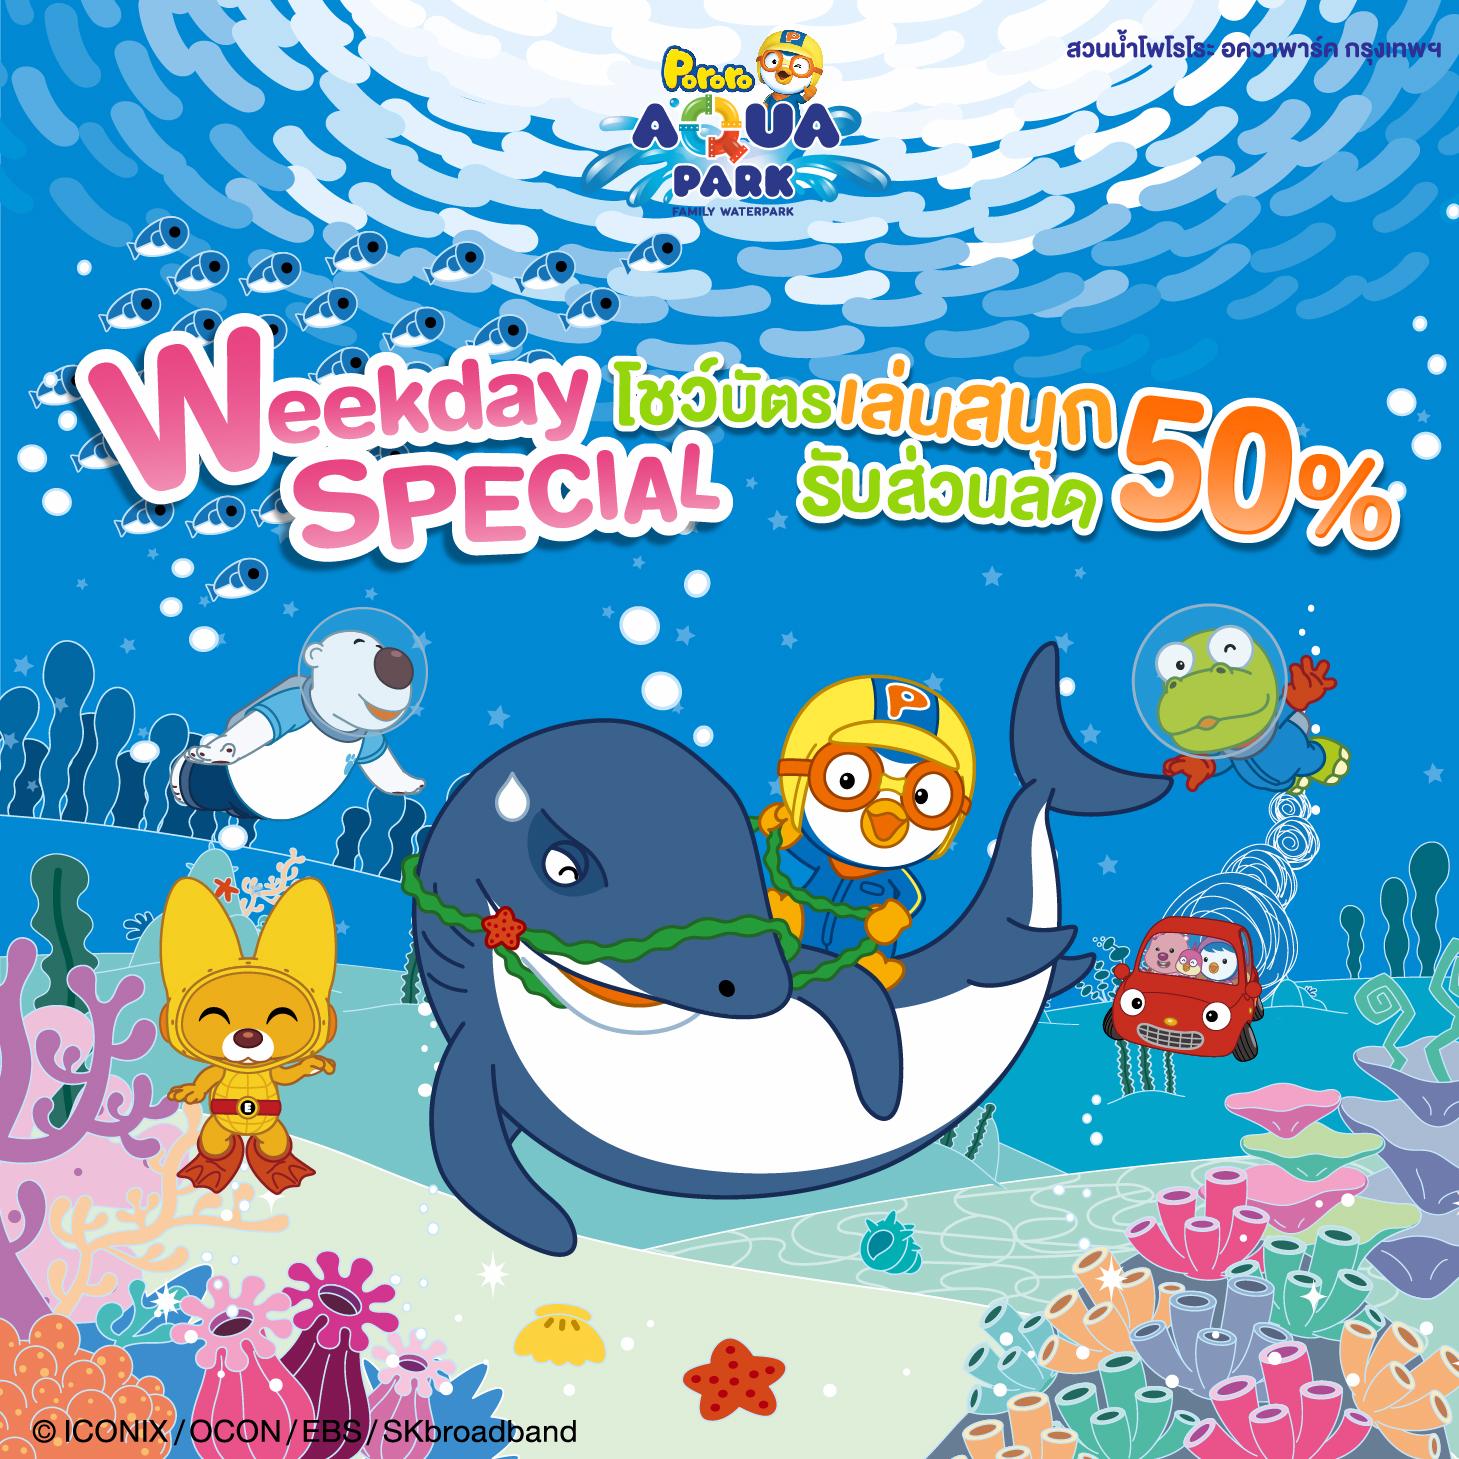 Weekday Special โชว์บัตร เล่นสนุก รับส่วนลด | Pororo AquaPark Bangkok